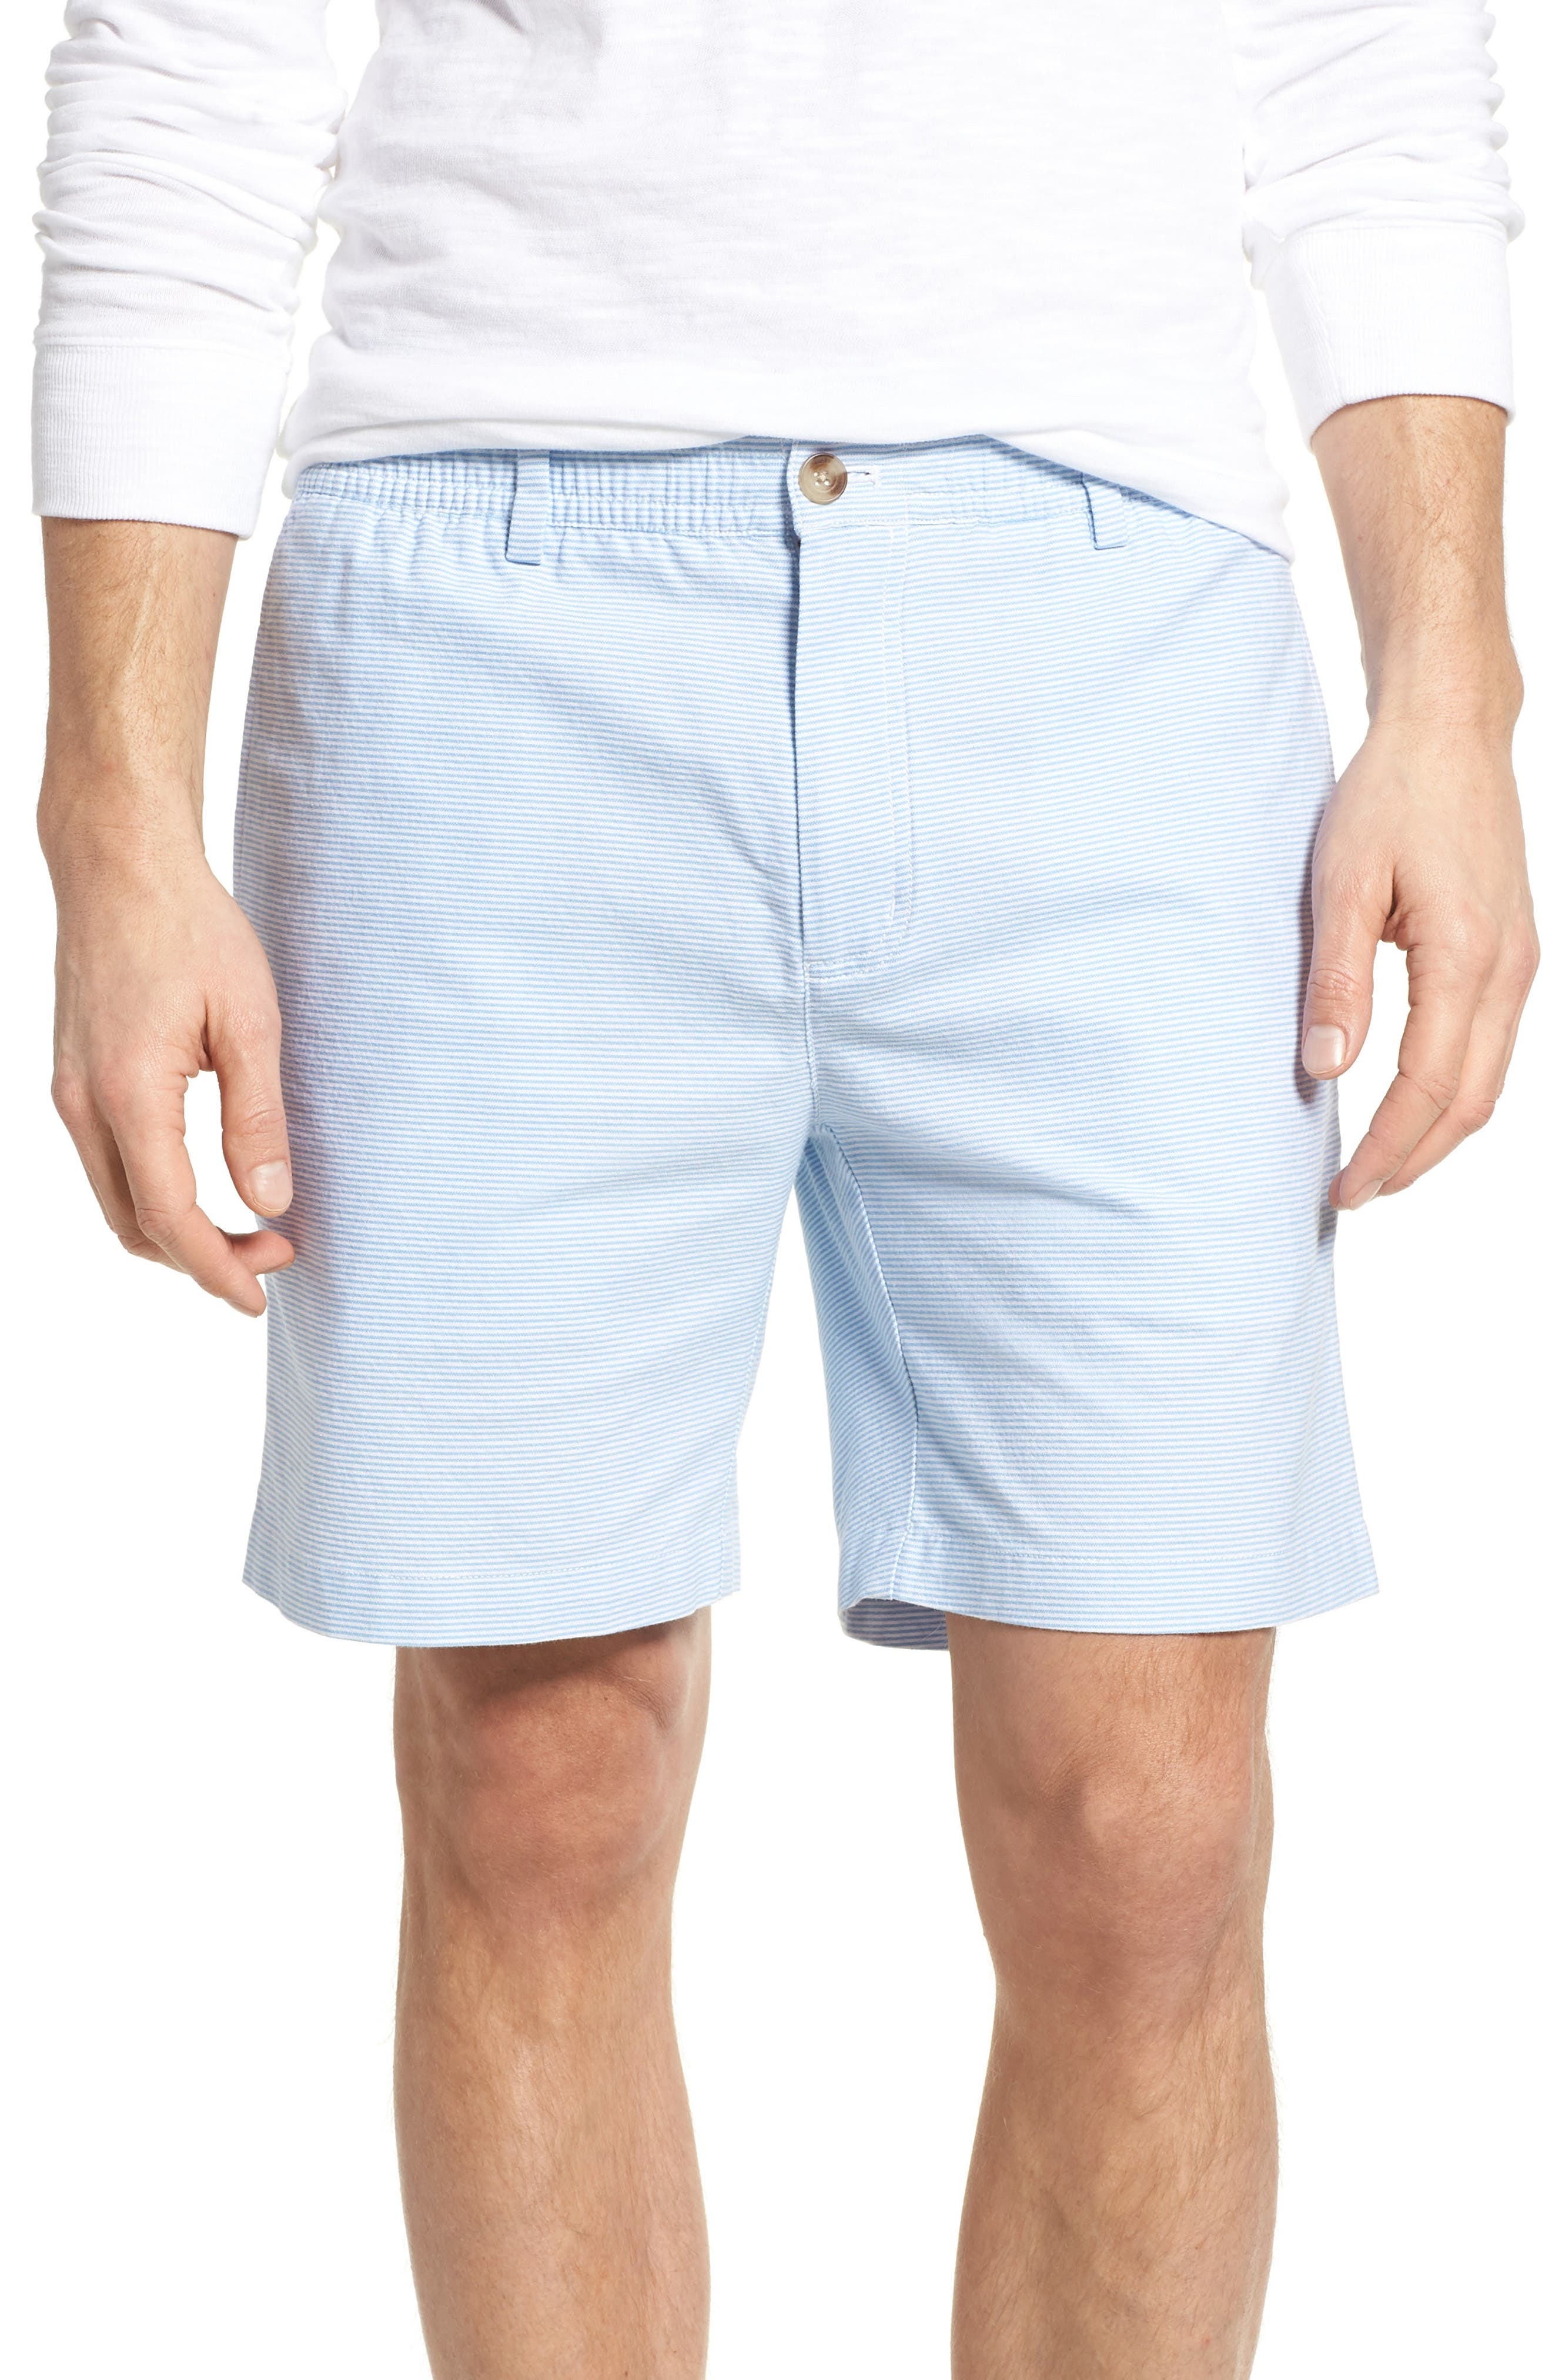 Jetty Stripe Stretch Cotton Shorts,                         Main,                         color, Ocean Breeze